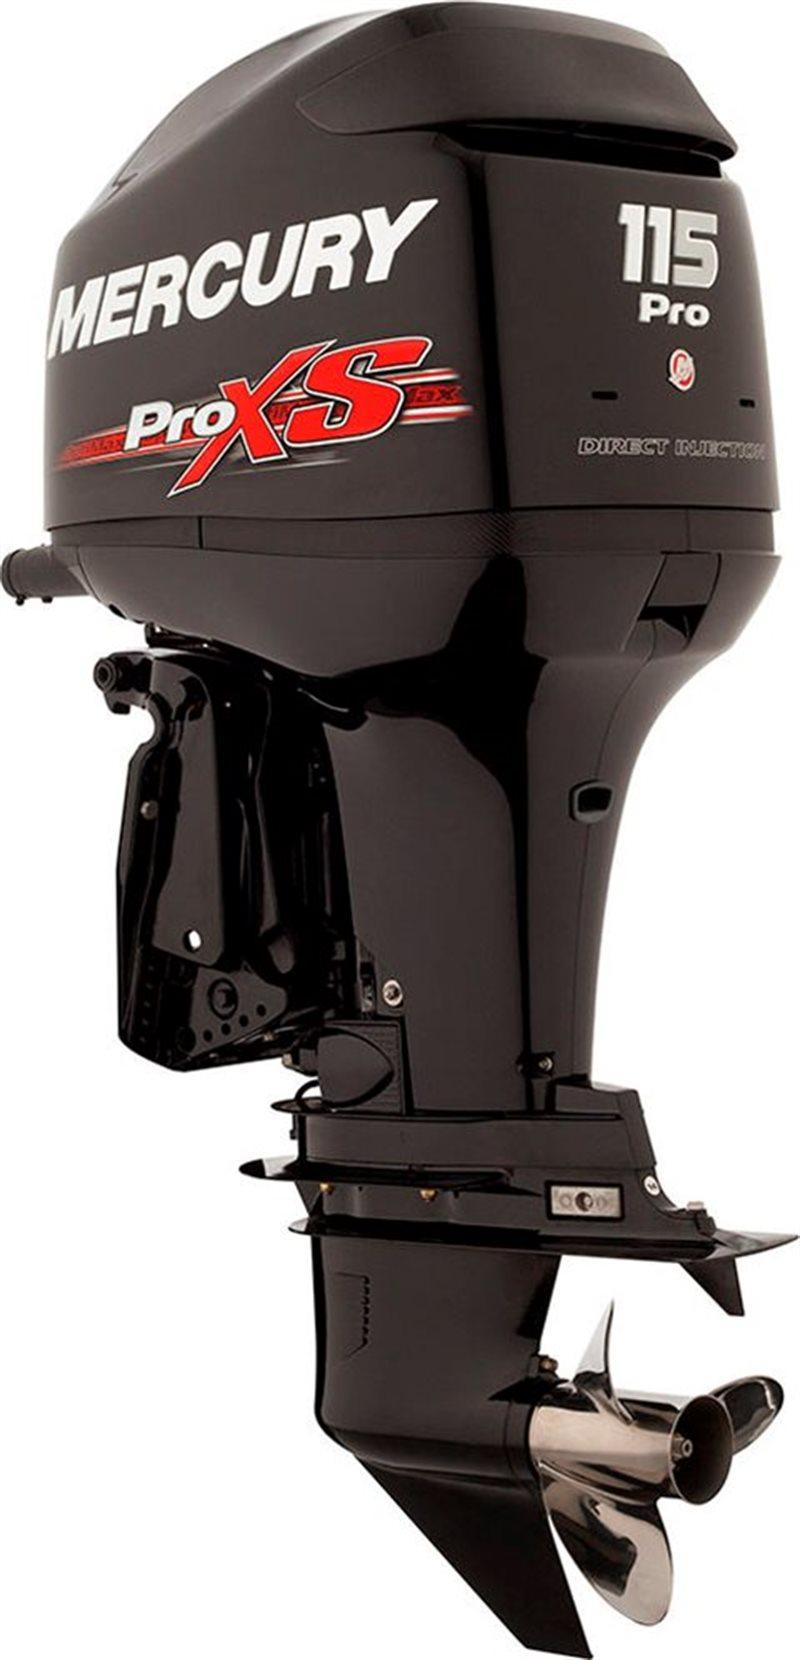 2021 Mercury Outboard 115 Pro XS 115 hp at Pharo Marine, Waunakee, WI 53597